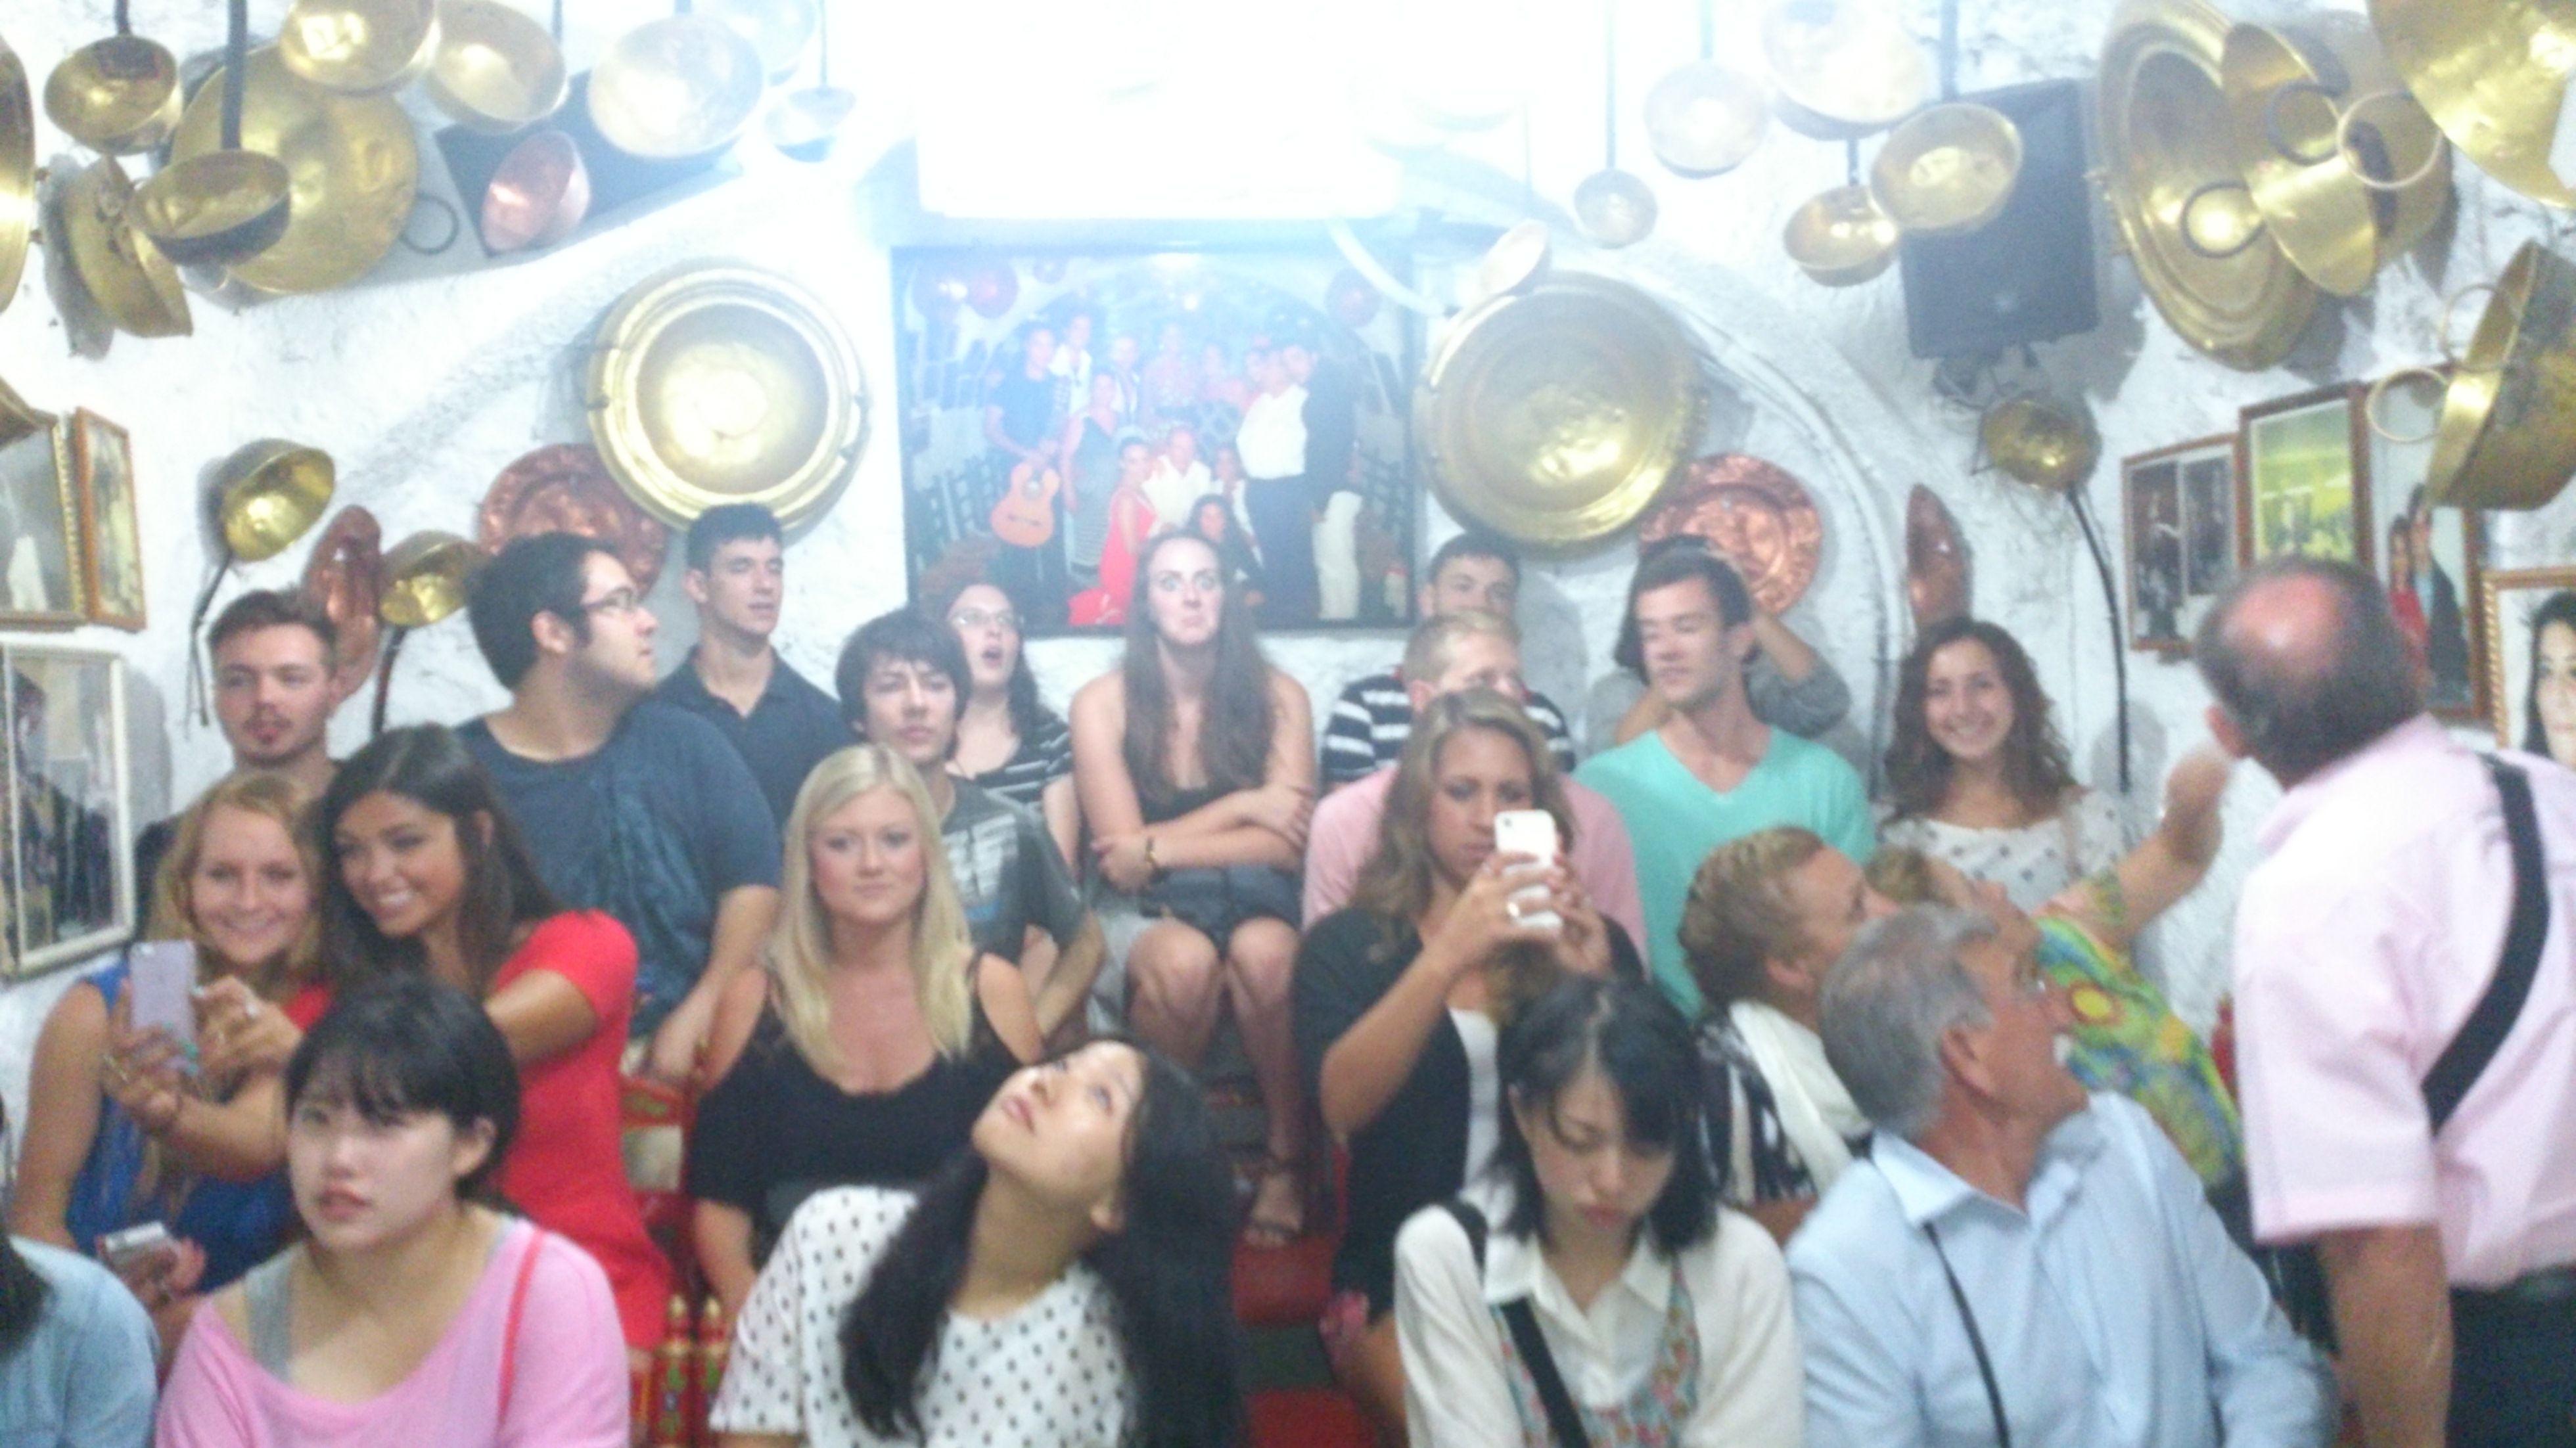 #alicanteexperience  #spanishcourses #incomingua #erasmusua #cursosespañolua #disfrutayaprende #studyabroad #enjoyandlearn #costablanca #alicante #campusua #learnspanish #ELE #granada